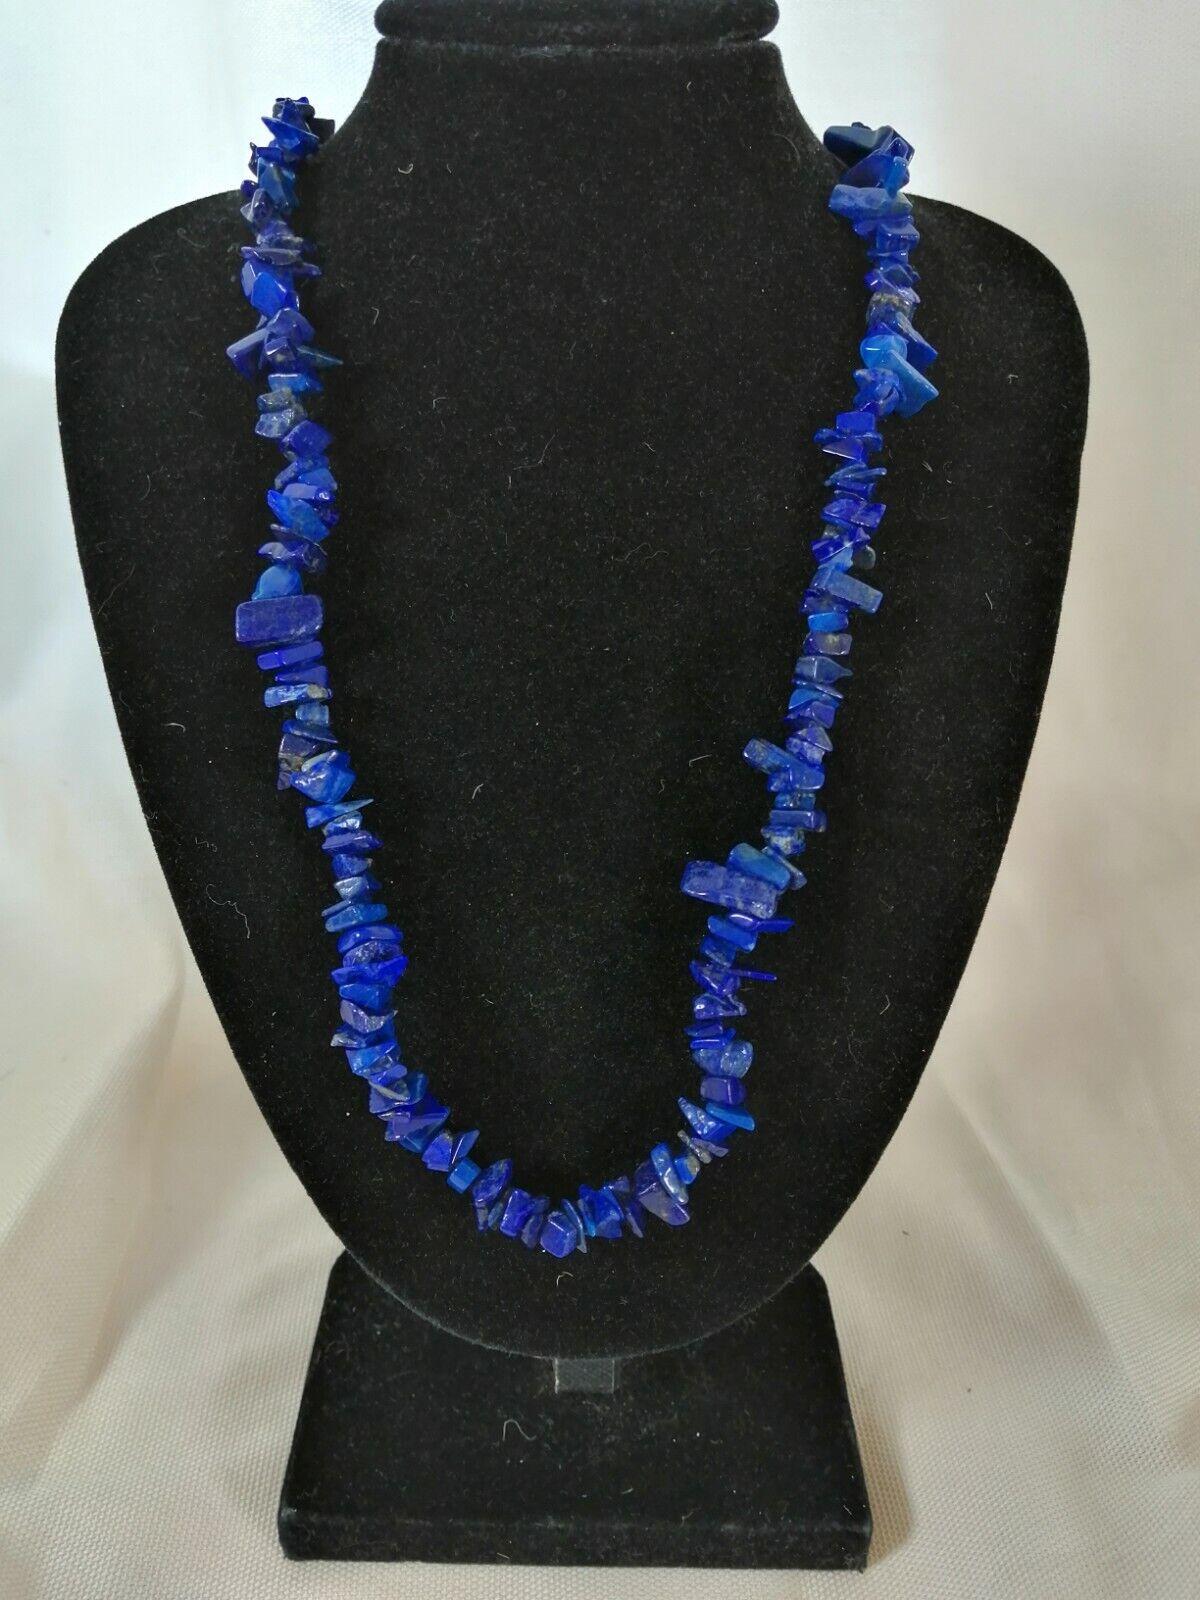 "Lapis Lazuli Chip Necklace 16"" to 34"", Long Necklace, Short Necklace"